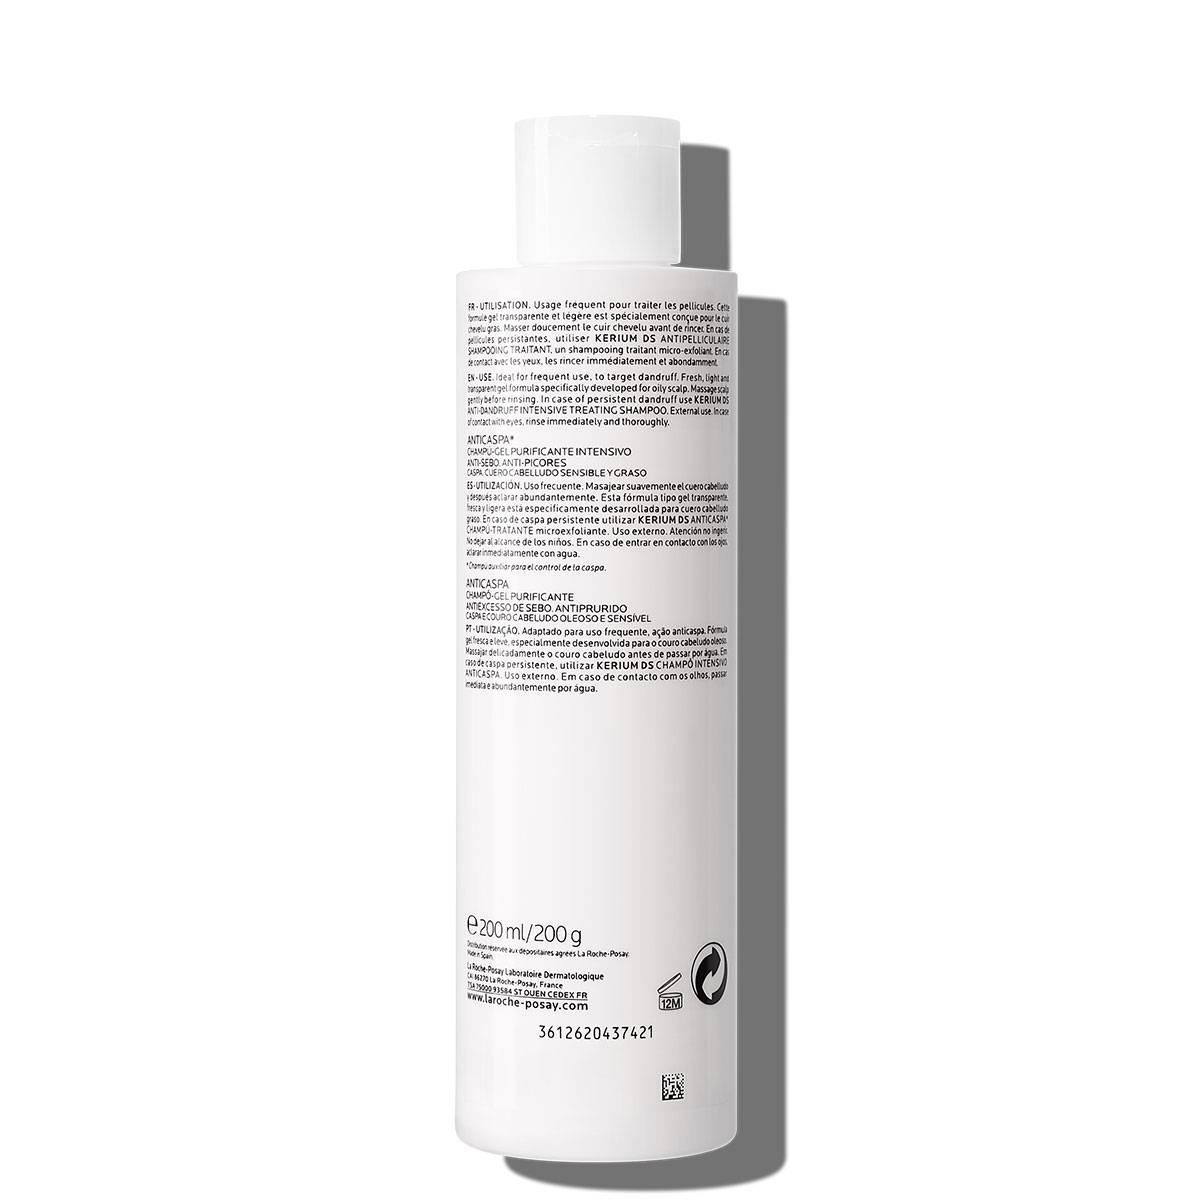 La Roche Posay ProductPage Kerium Anti Dandruff Gel Shampoo 200ml 3433